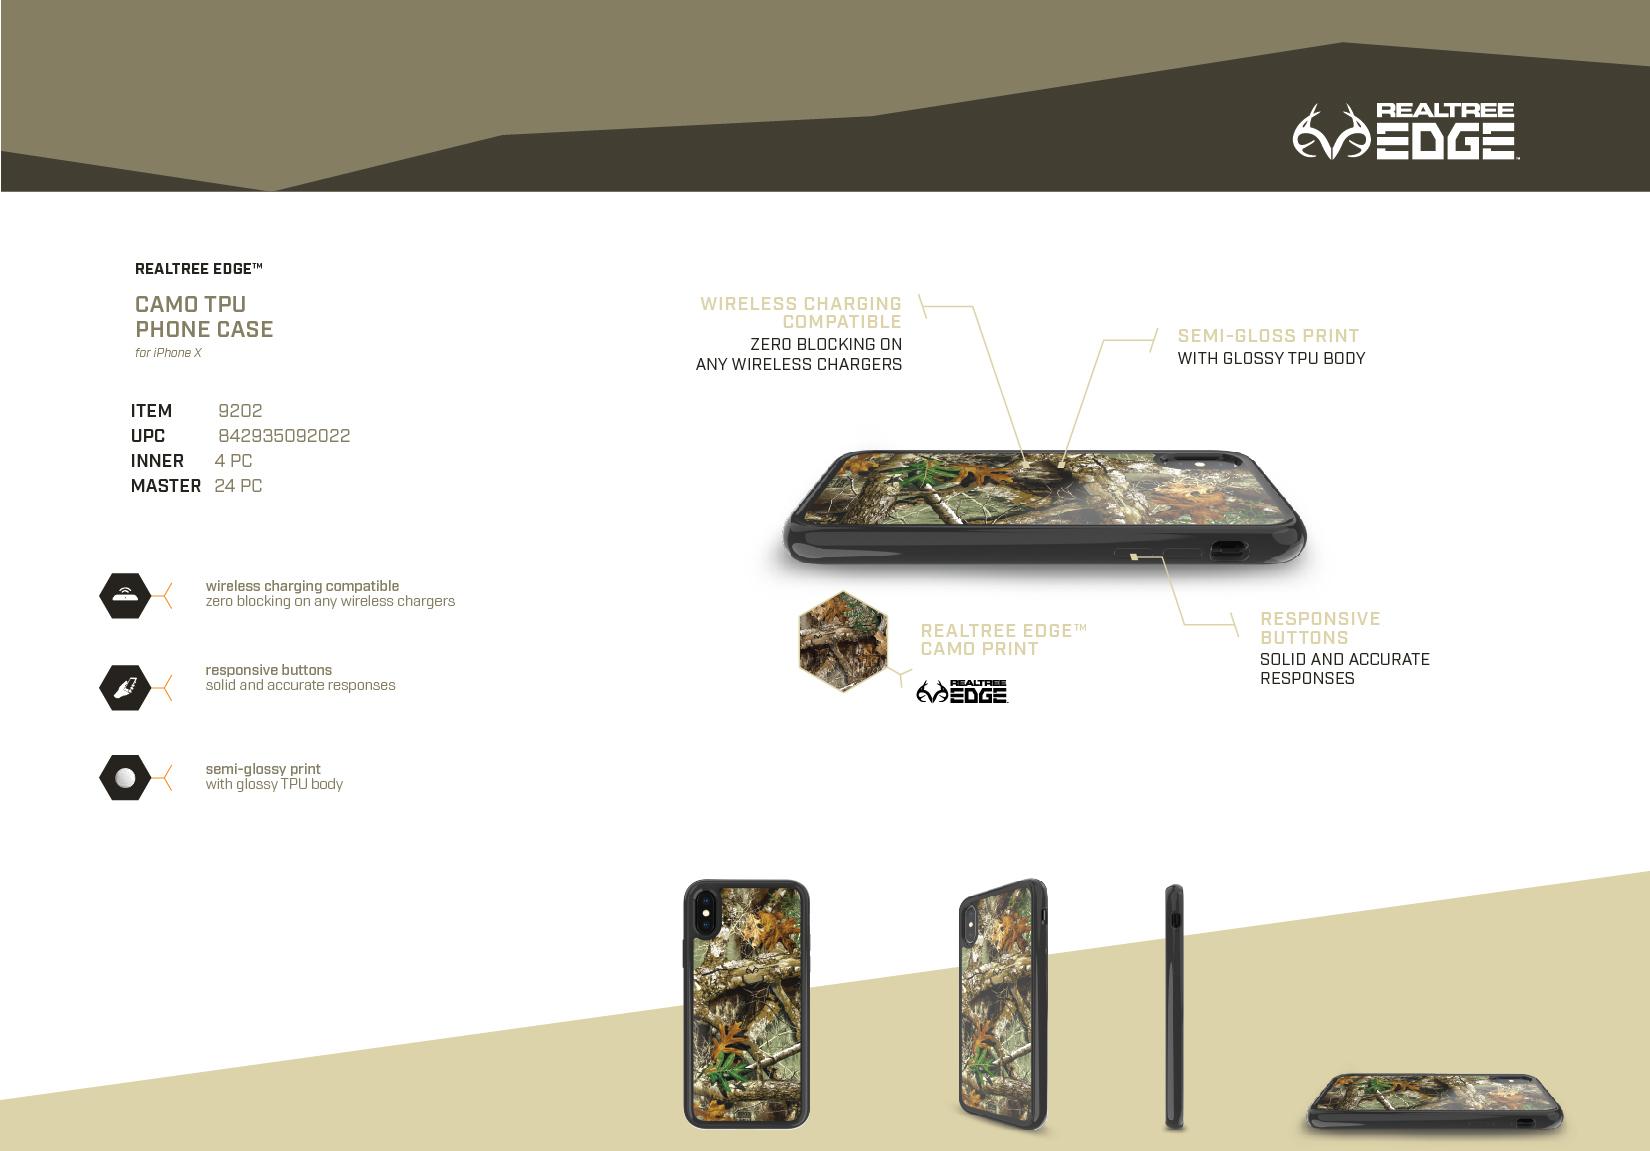 9202_RealTree Camo TPU Phone Case_spec sheet_9202_Camo TPU Phone Case copy.jpg